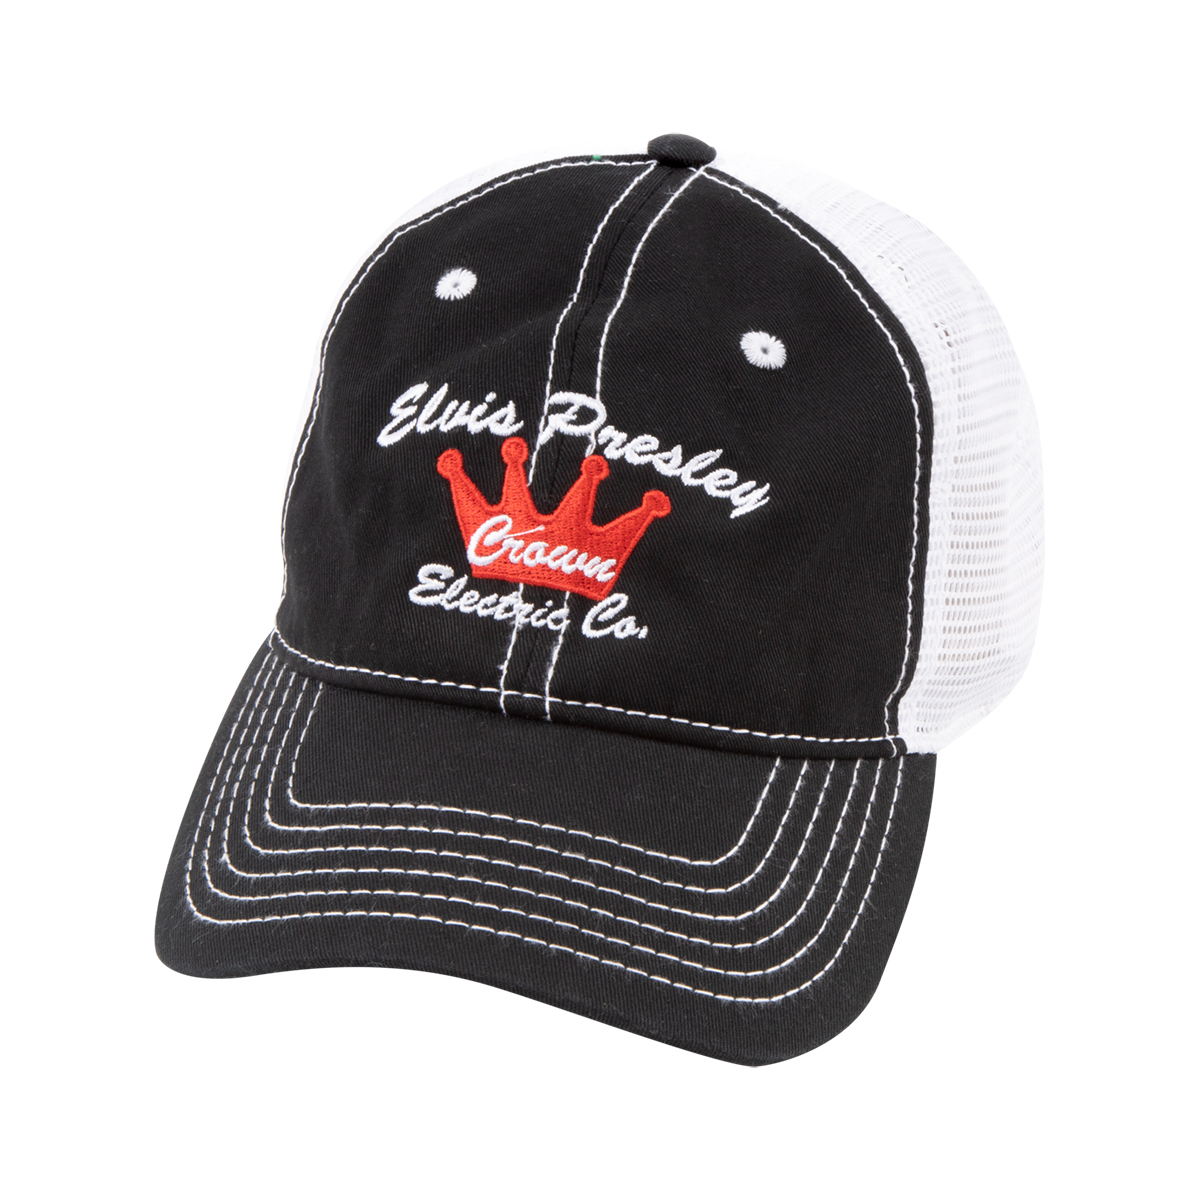 Elvis Presley Crown Electric Co Trucker Hat